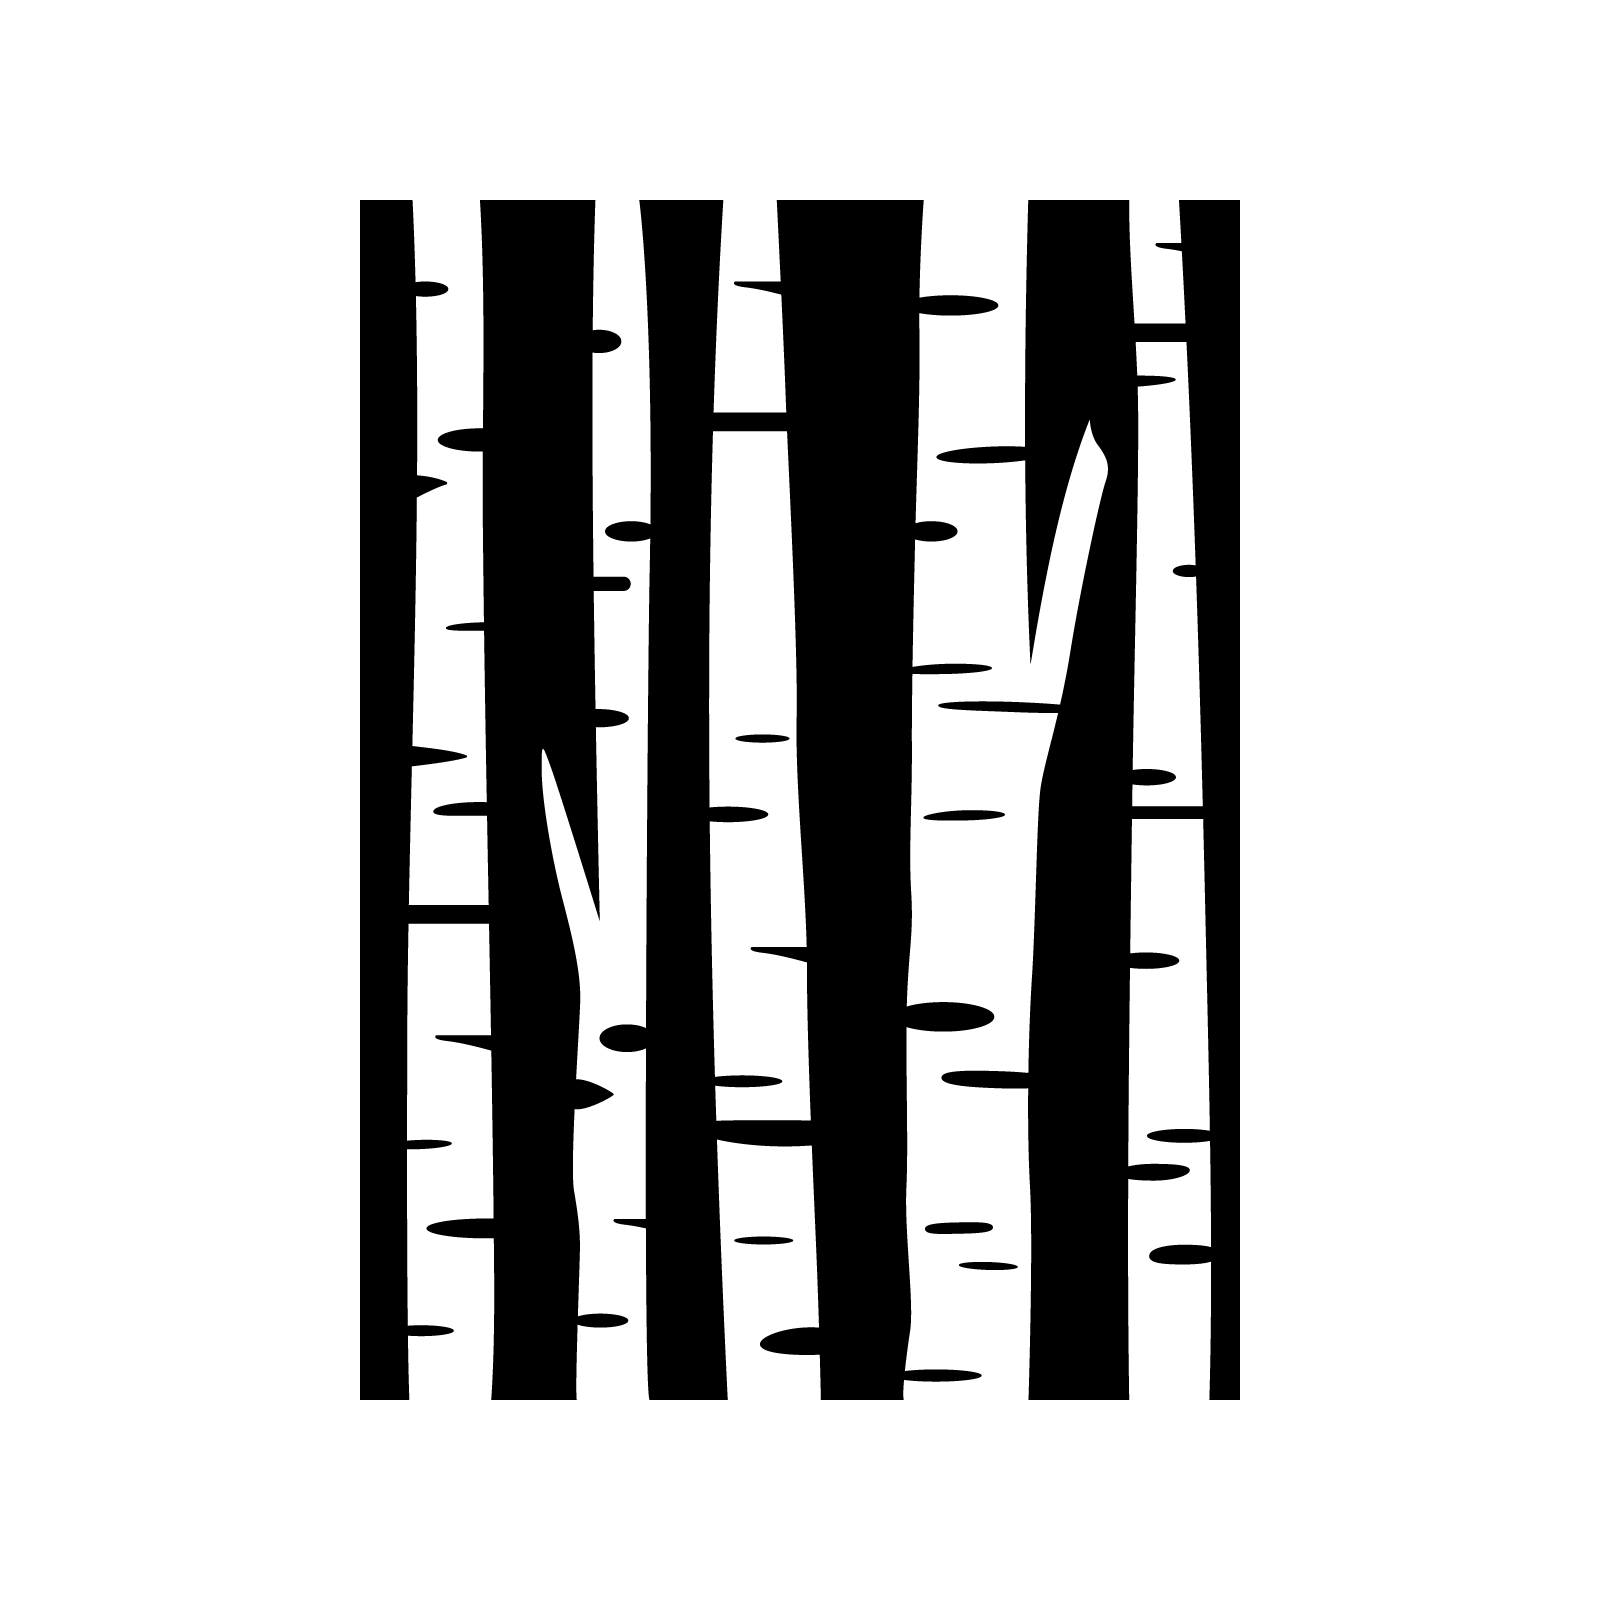 1600x1600 Birch Tree Stencil Birch, Stenciling And Crafts